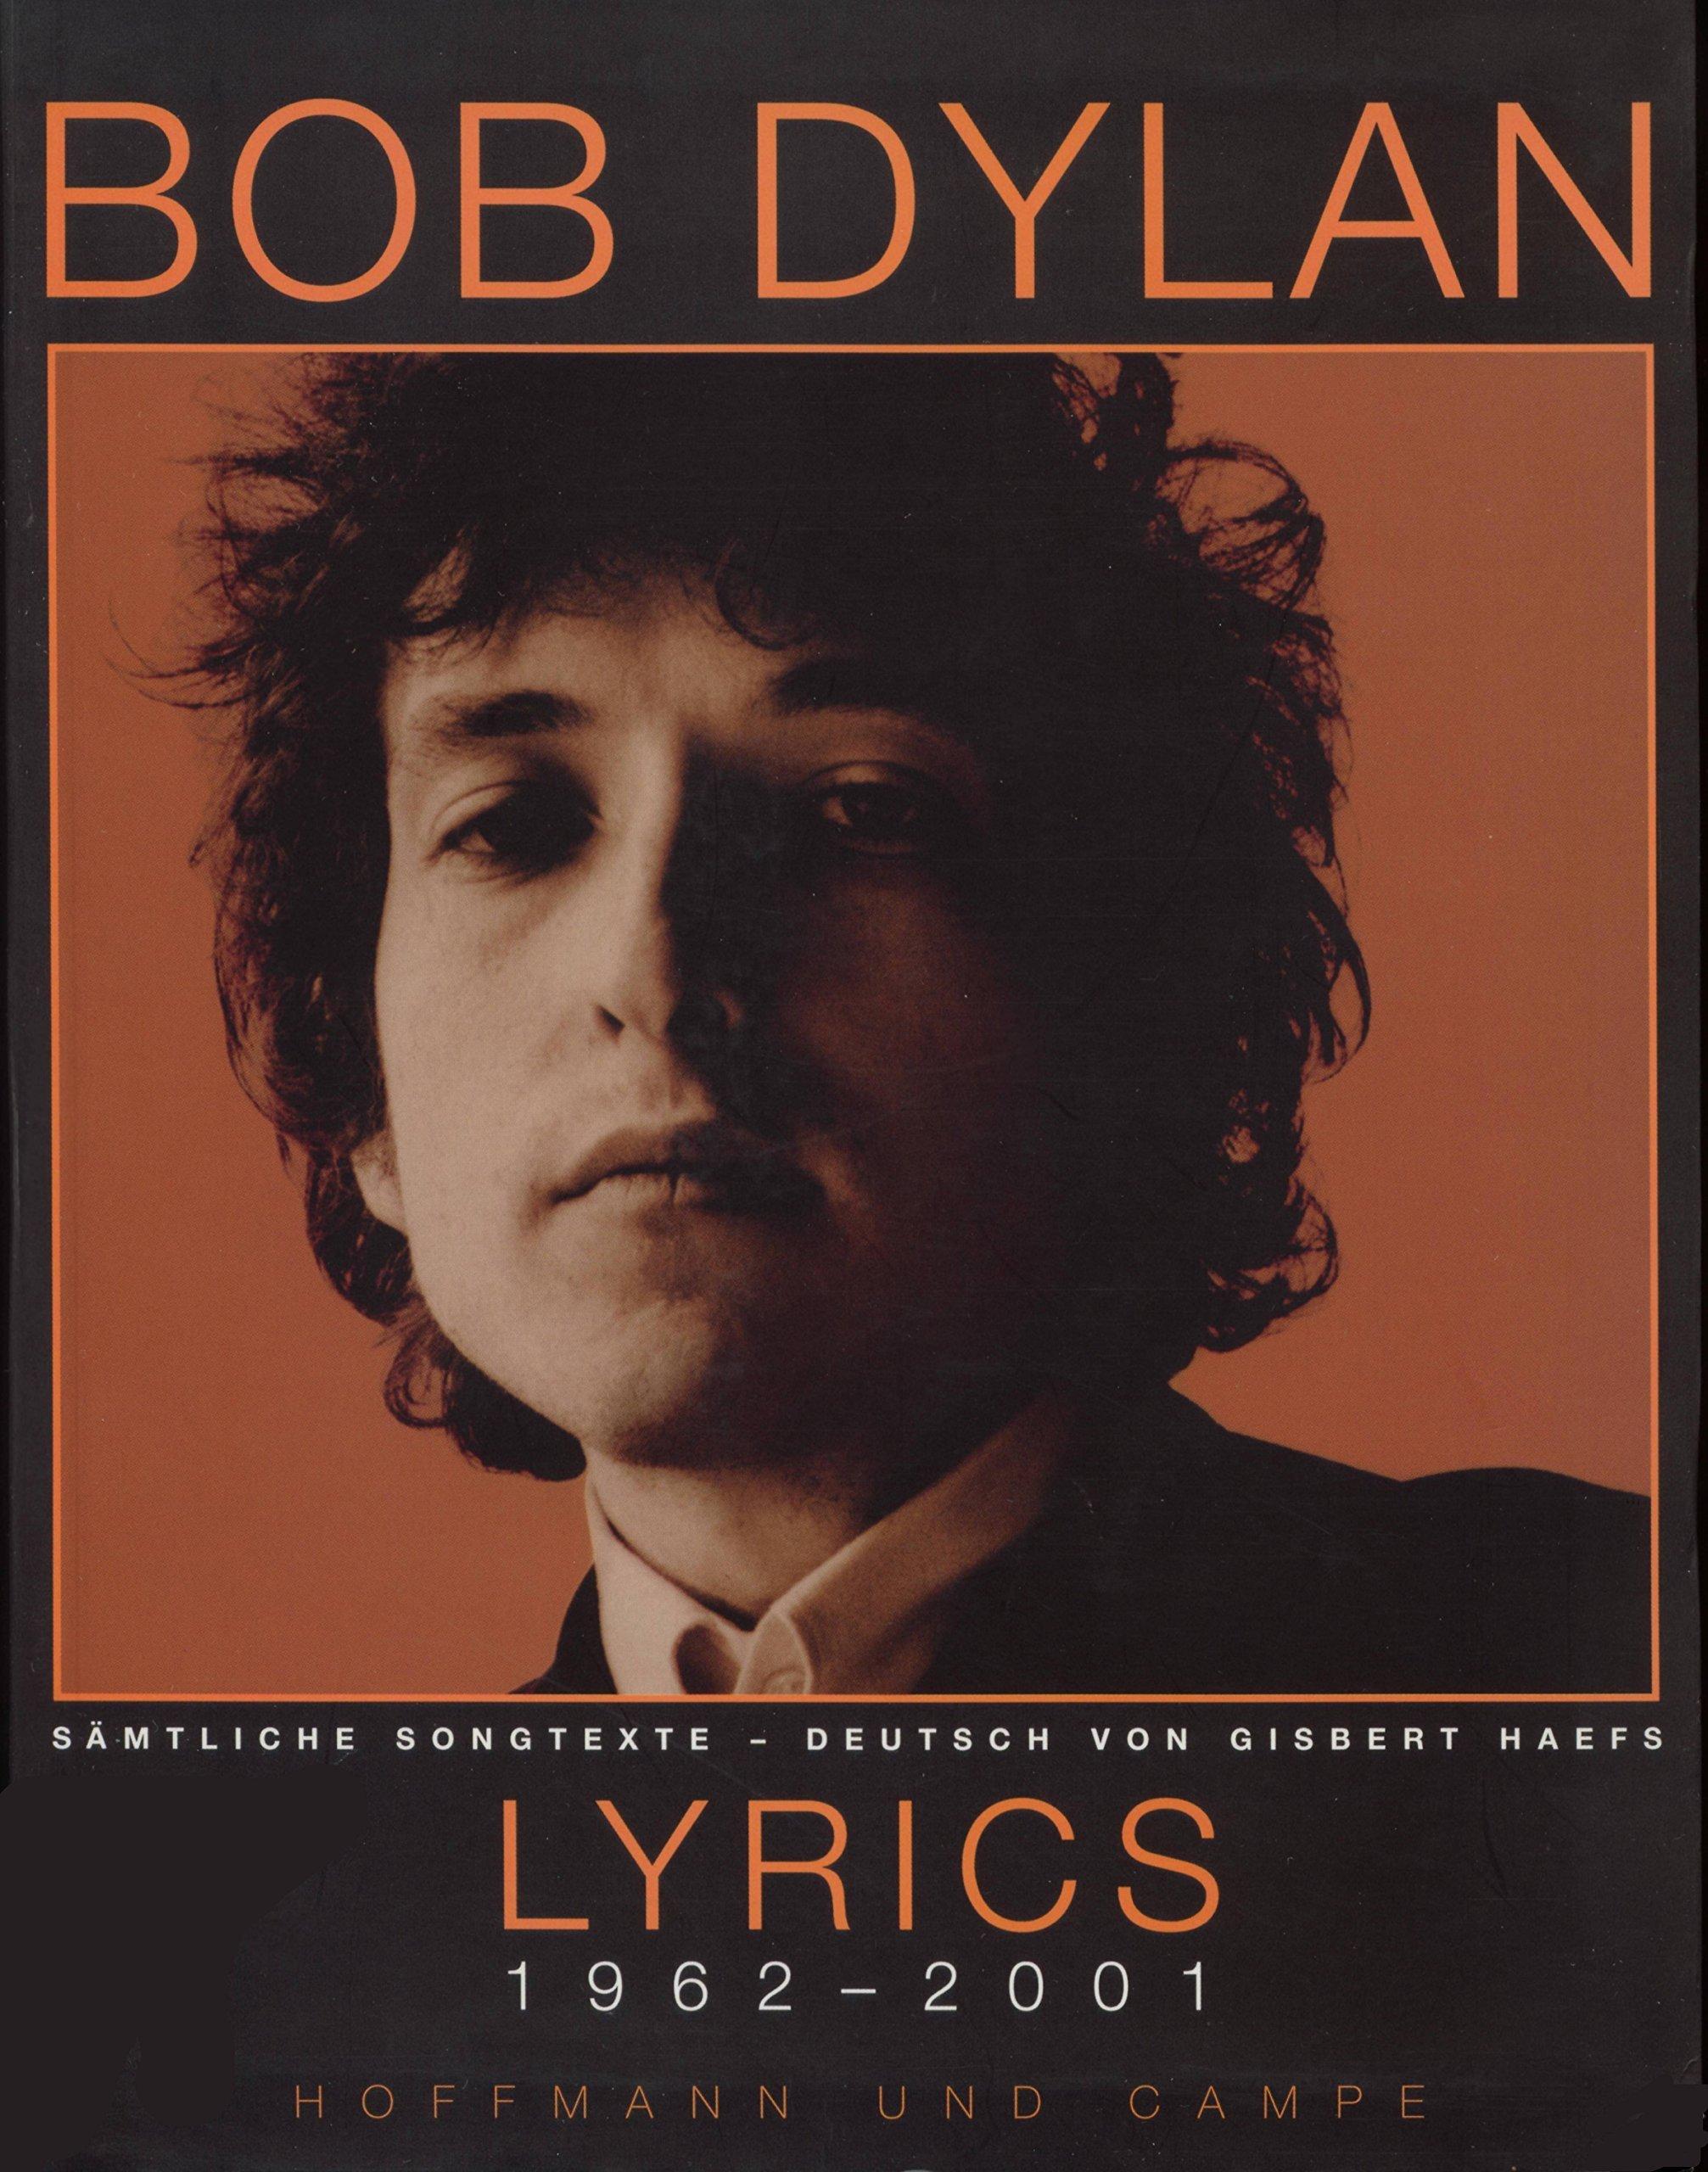 Bob Dylan Lyrics 1962-2001